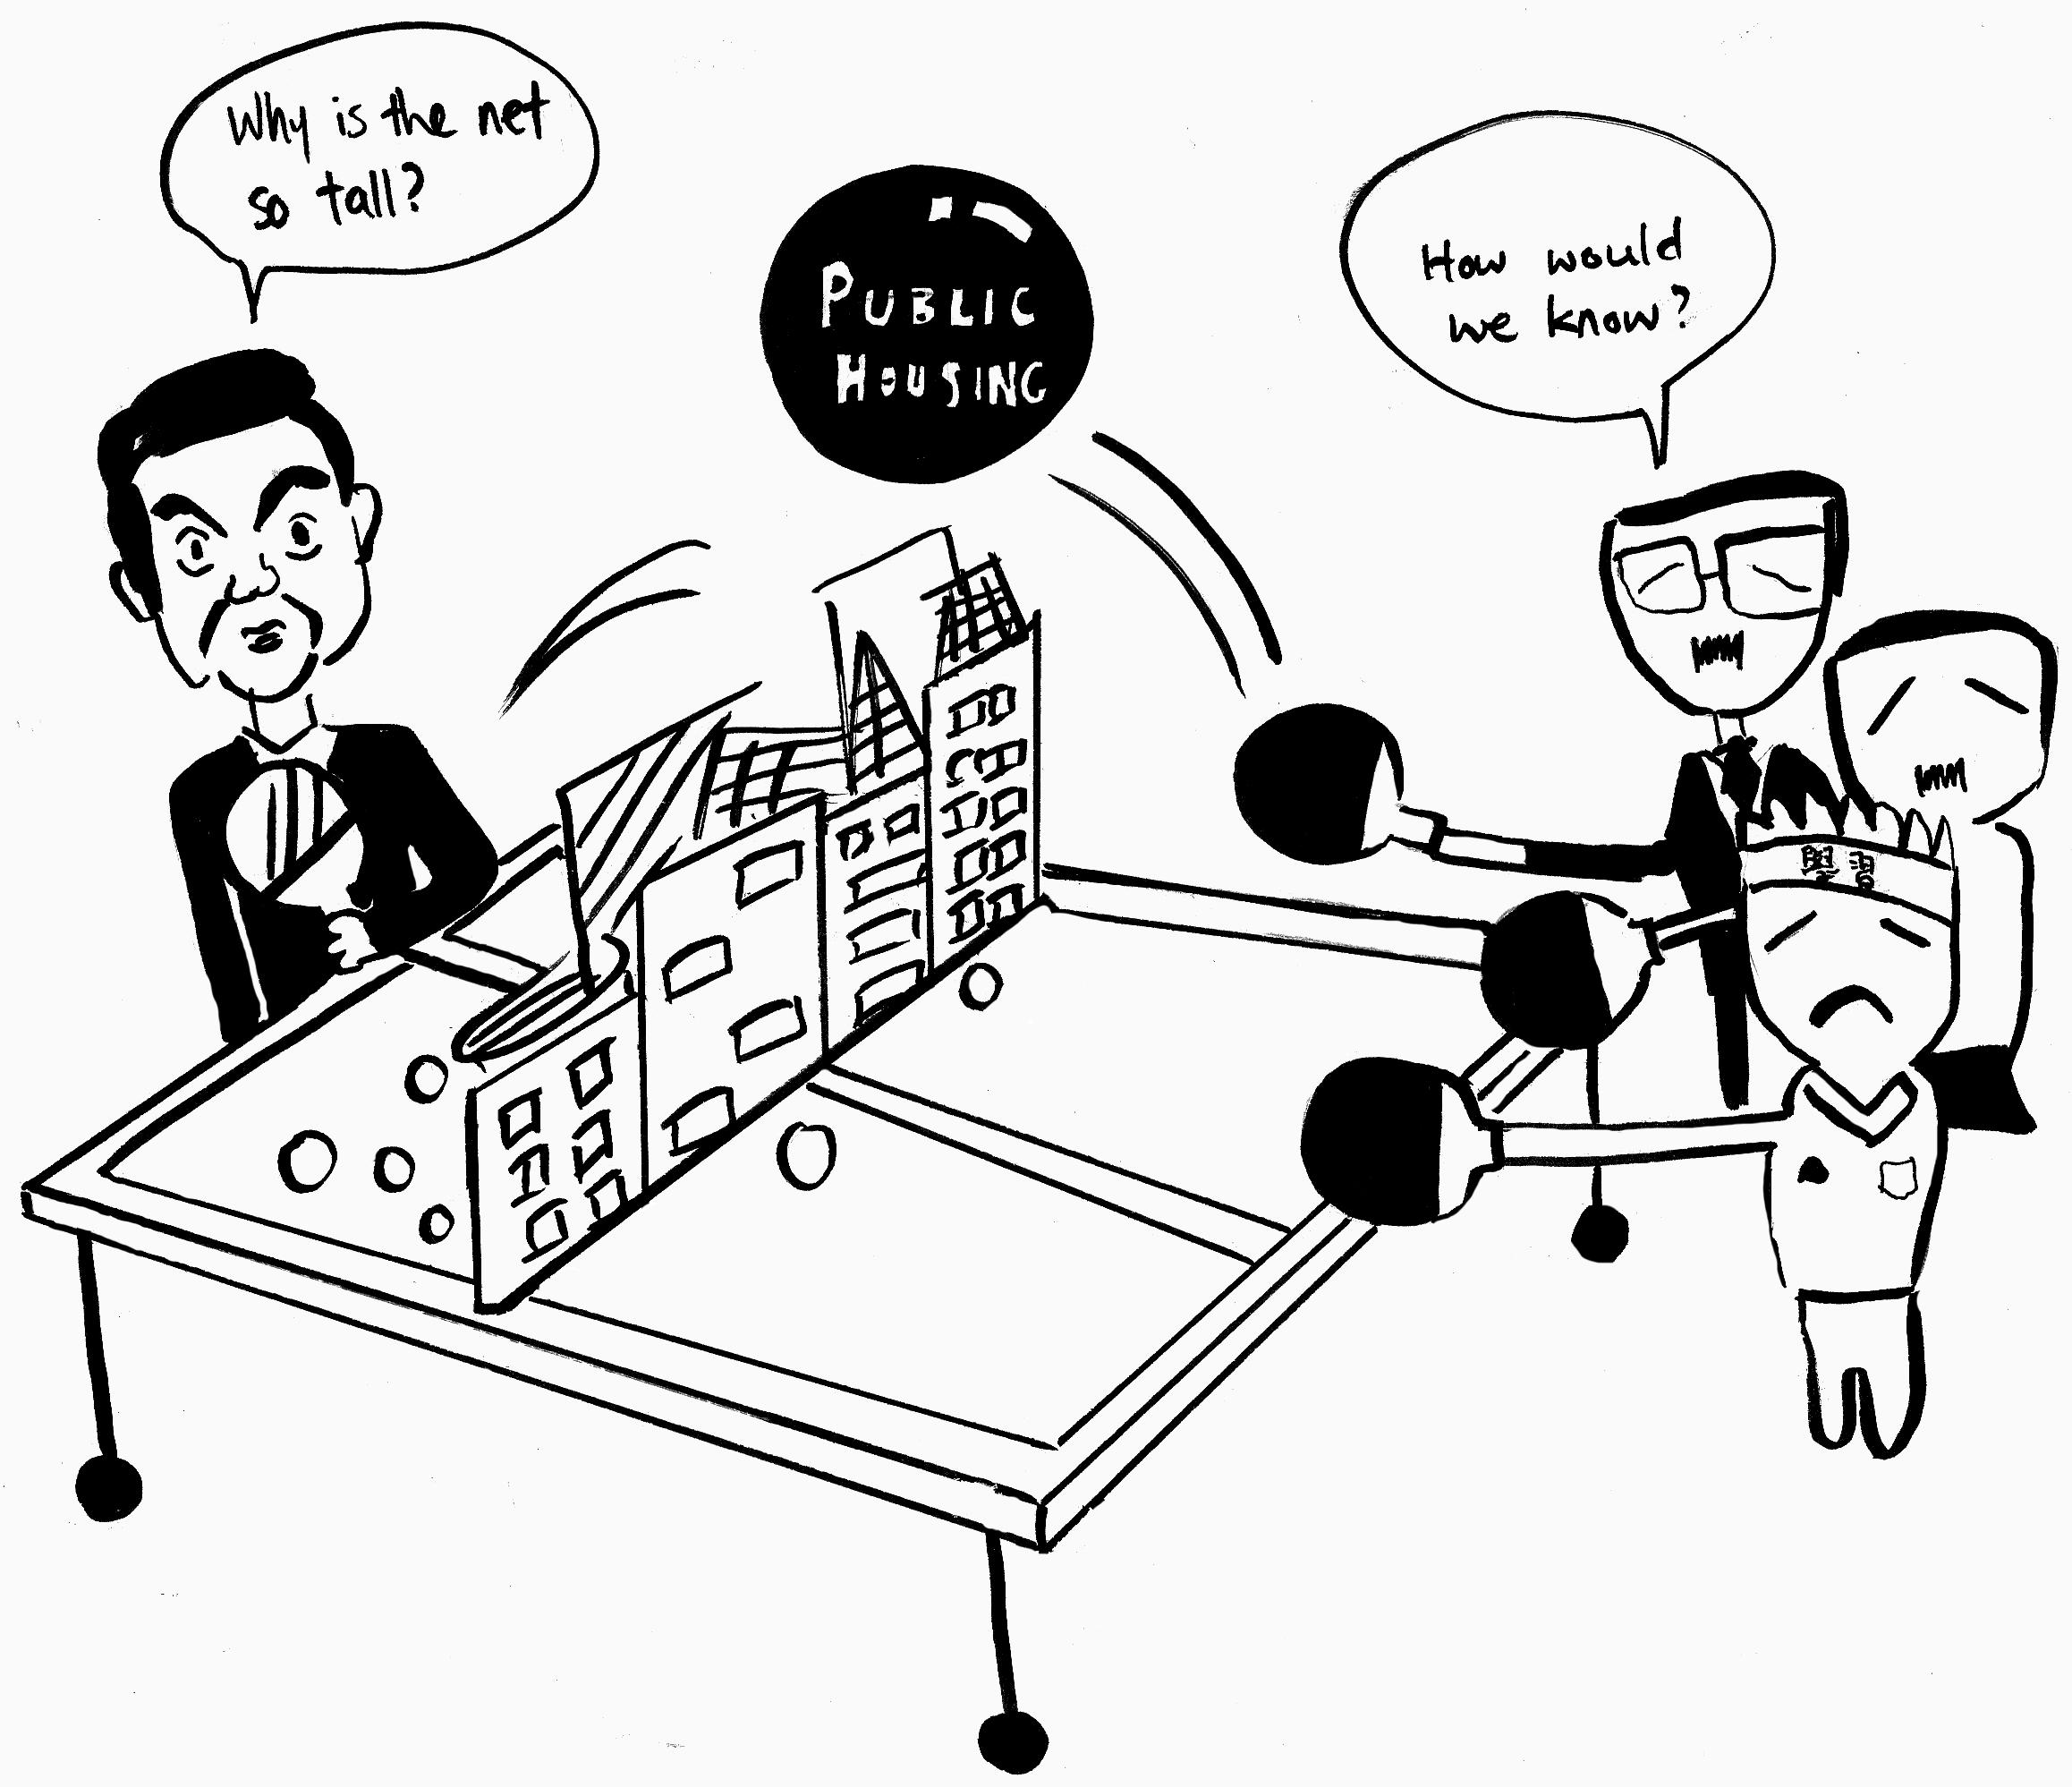 2316x1997 Ping Pong! (Political Cartoon Creation + Analysis) Ngrachel23